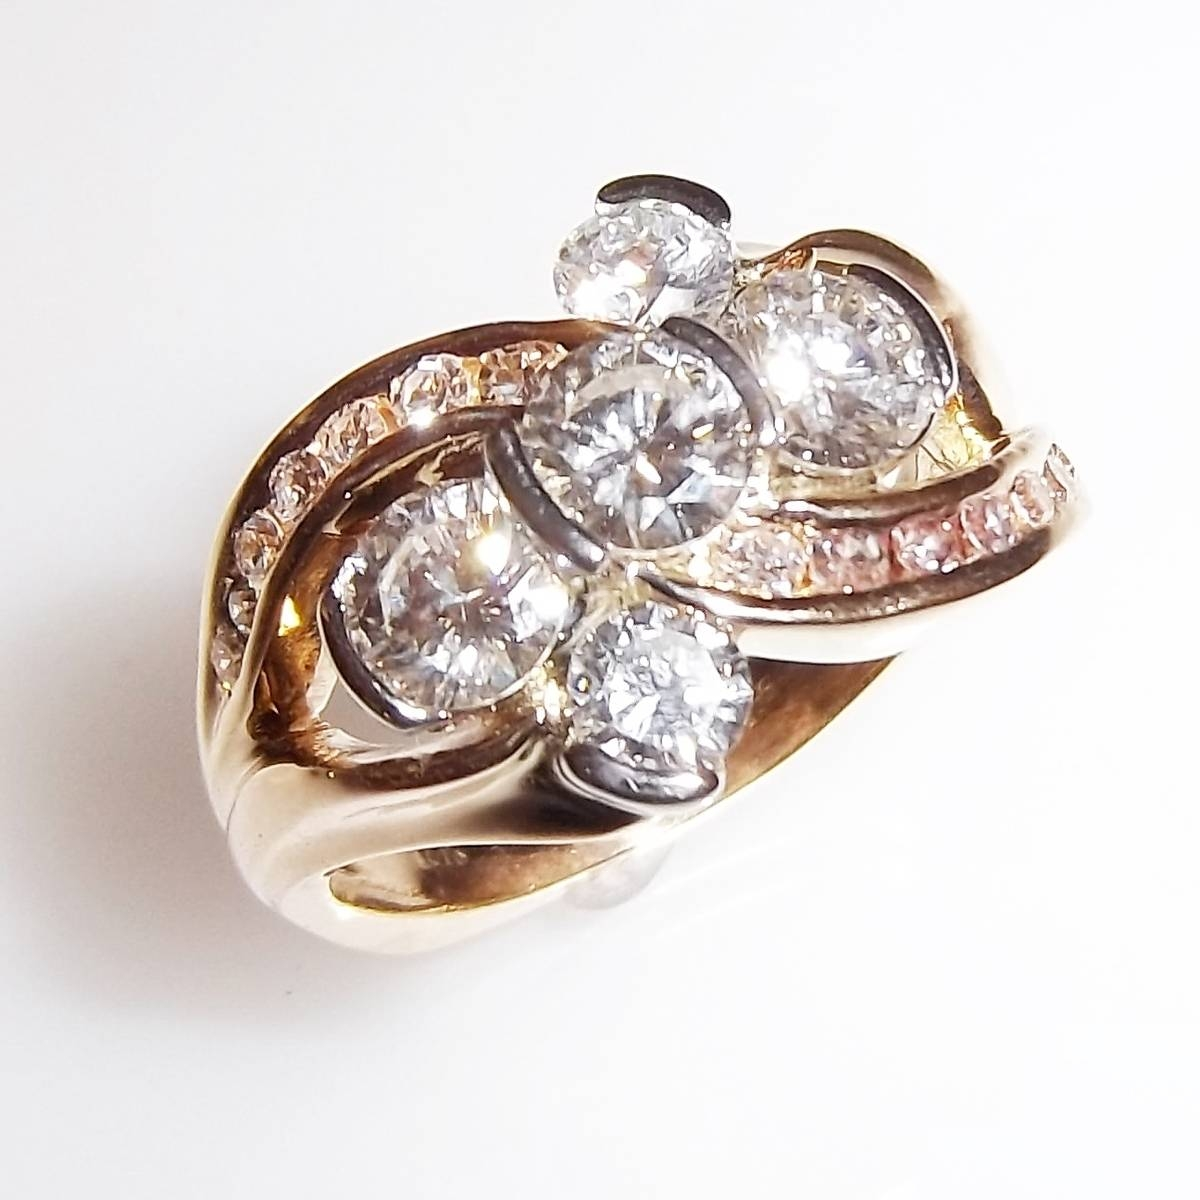 Wedding Rings : Cheap Diamond Rings 30Th Anniversary Rings For Within Recent Anniversary Rings For Sale (View 25 of 25)